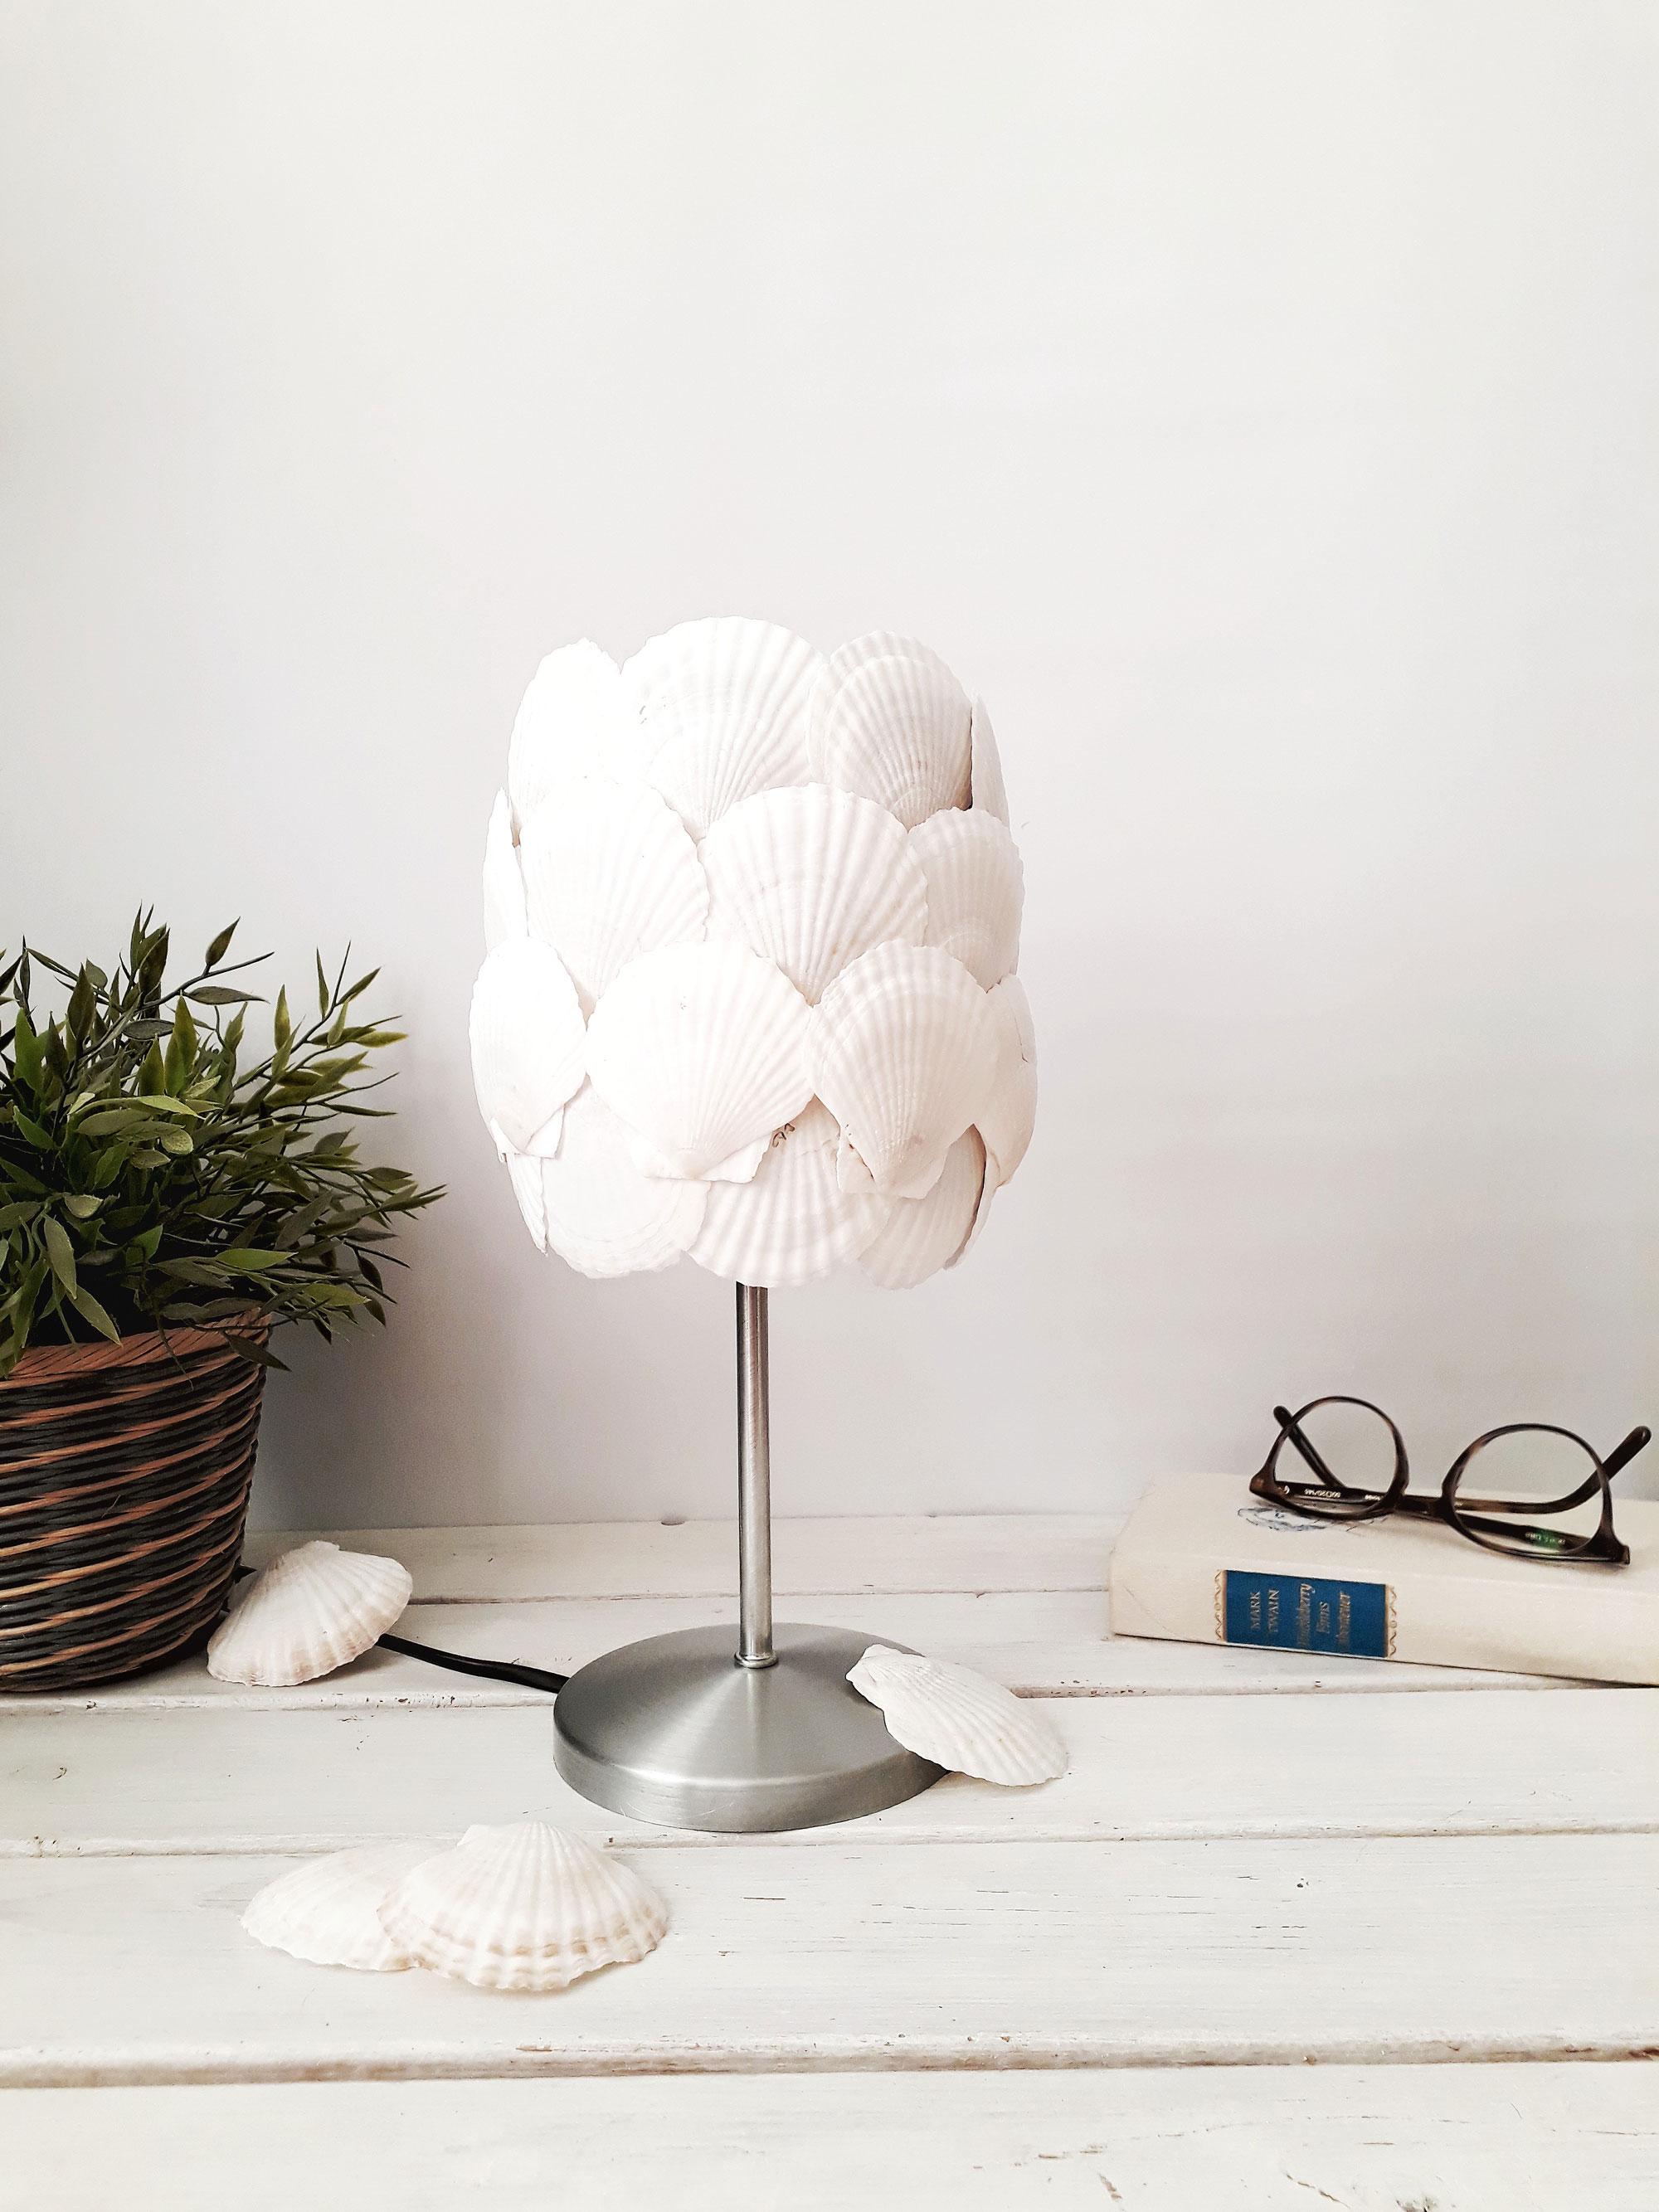 Maritime Muschel Lampe selbermachen – Upcycling Ikea Hack